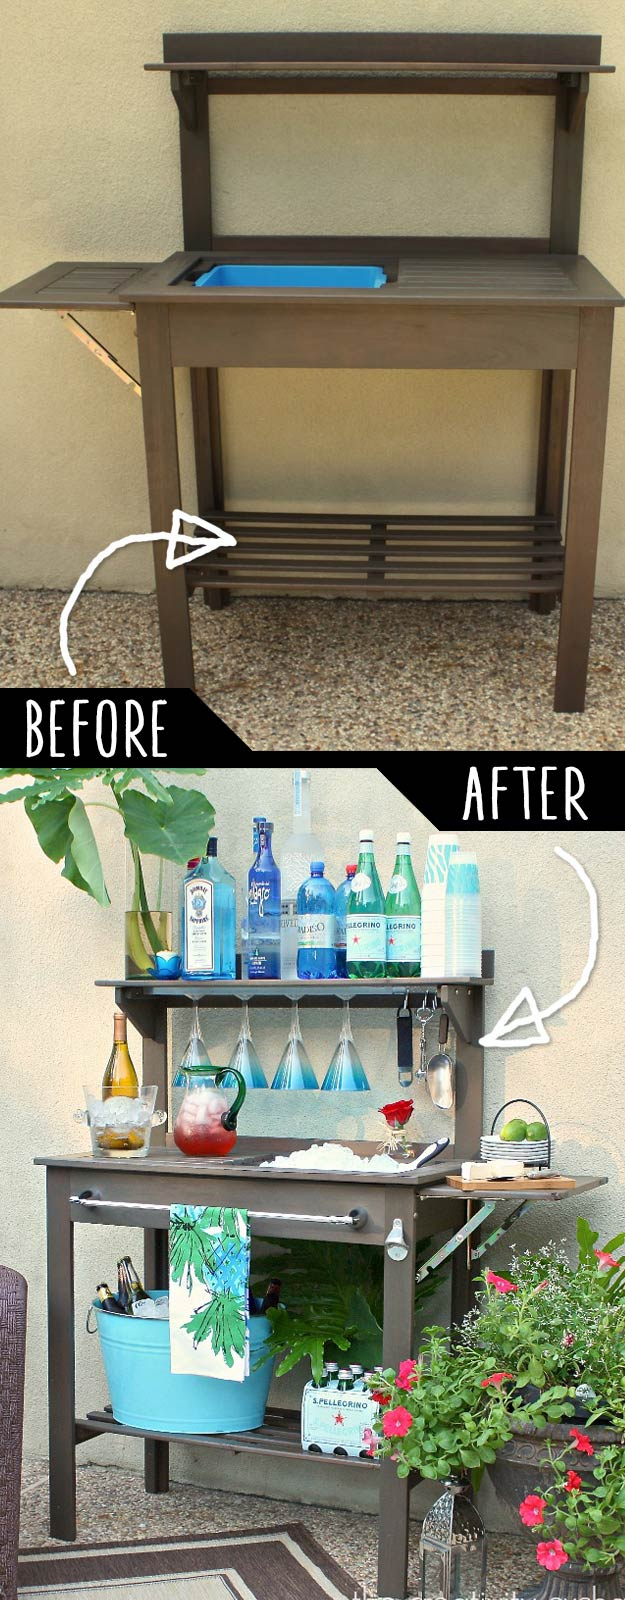 20 Amazing DIY ideas for furniture 20